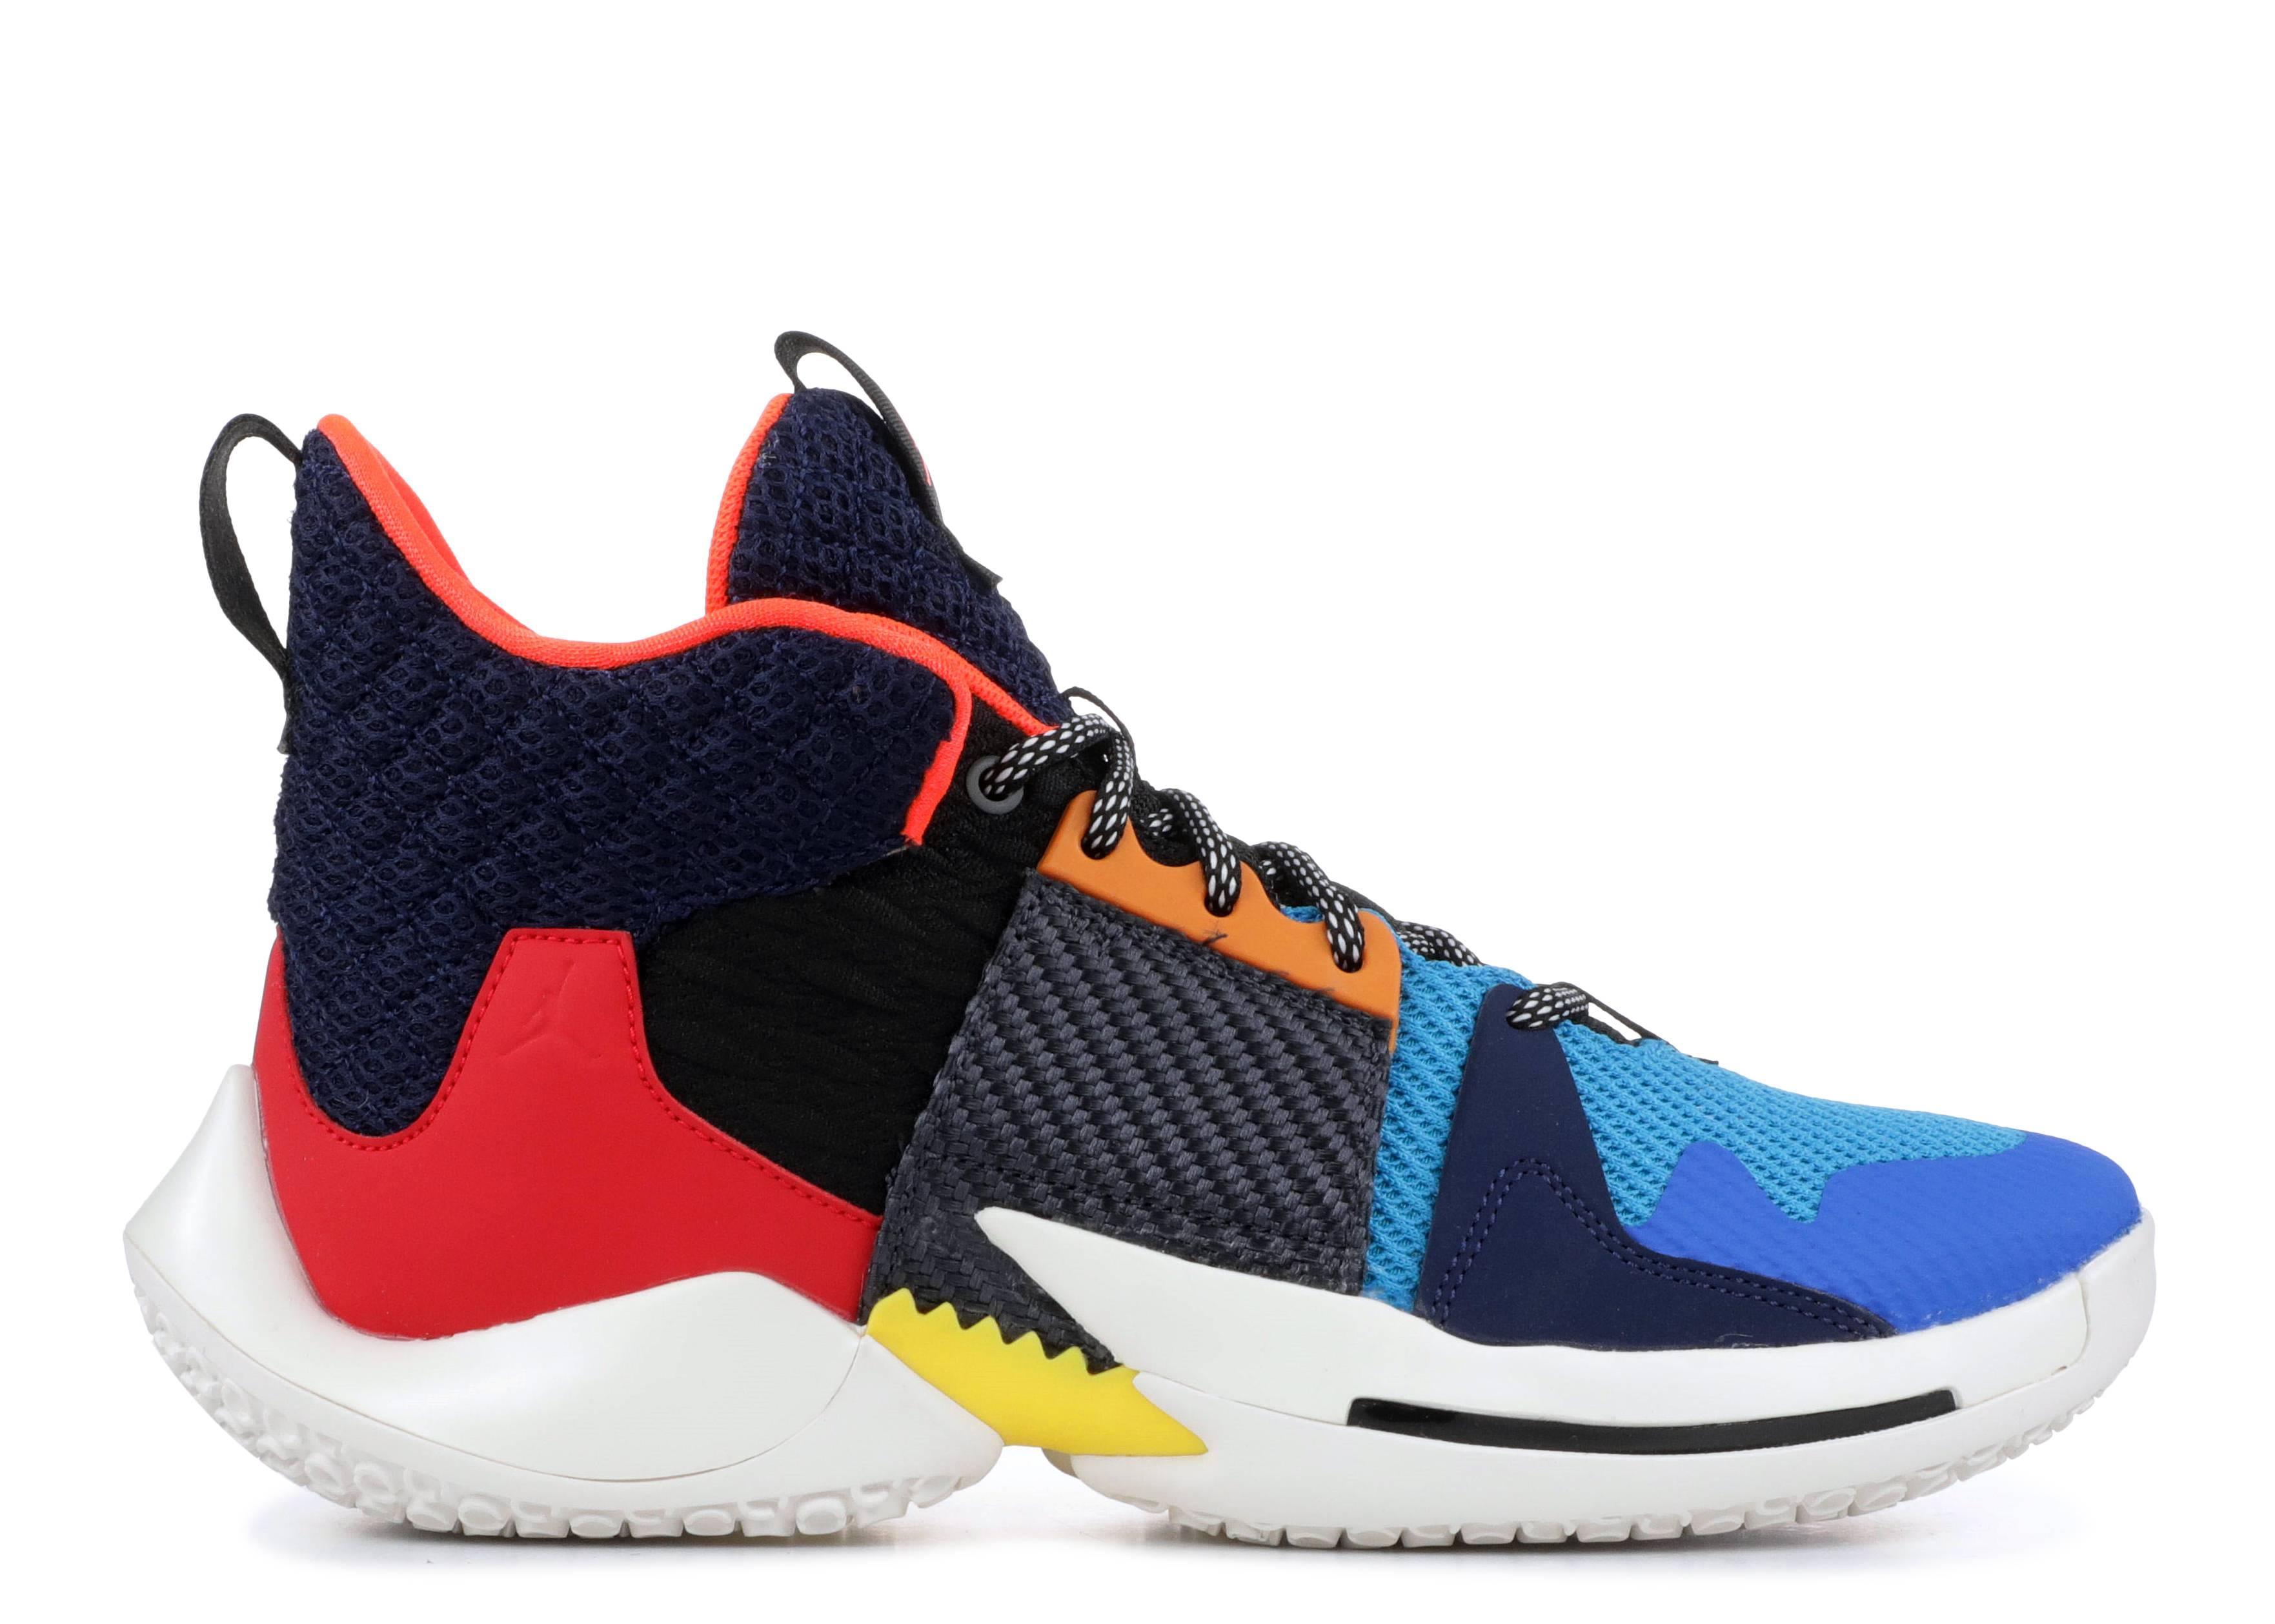 0a80133219df65 Other Jordans - Air Jordans